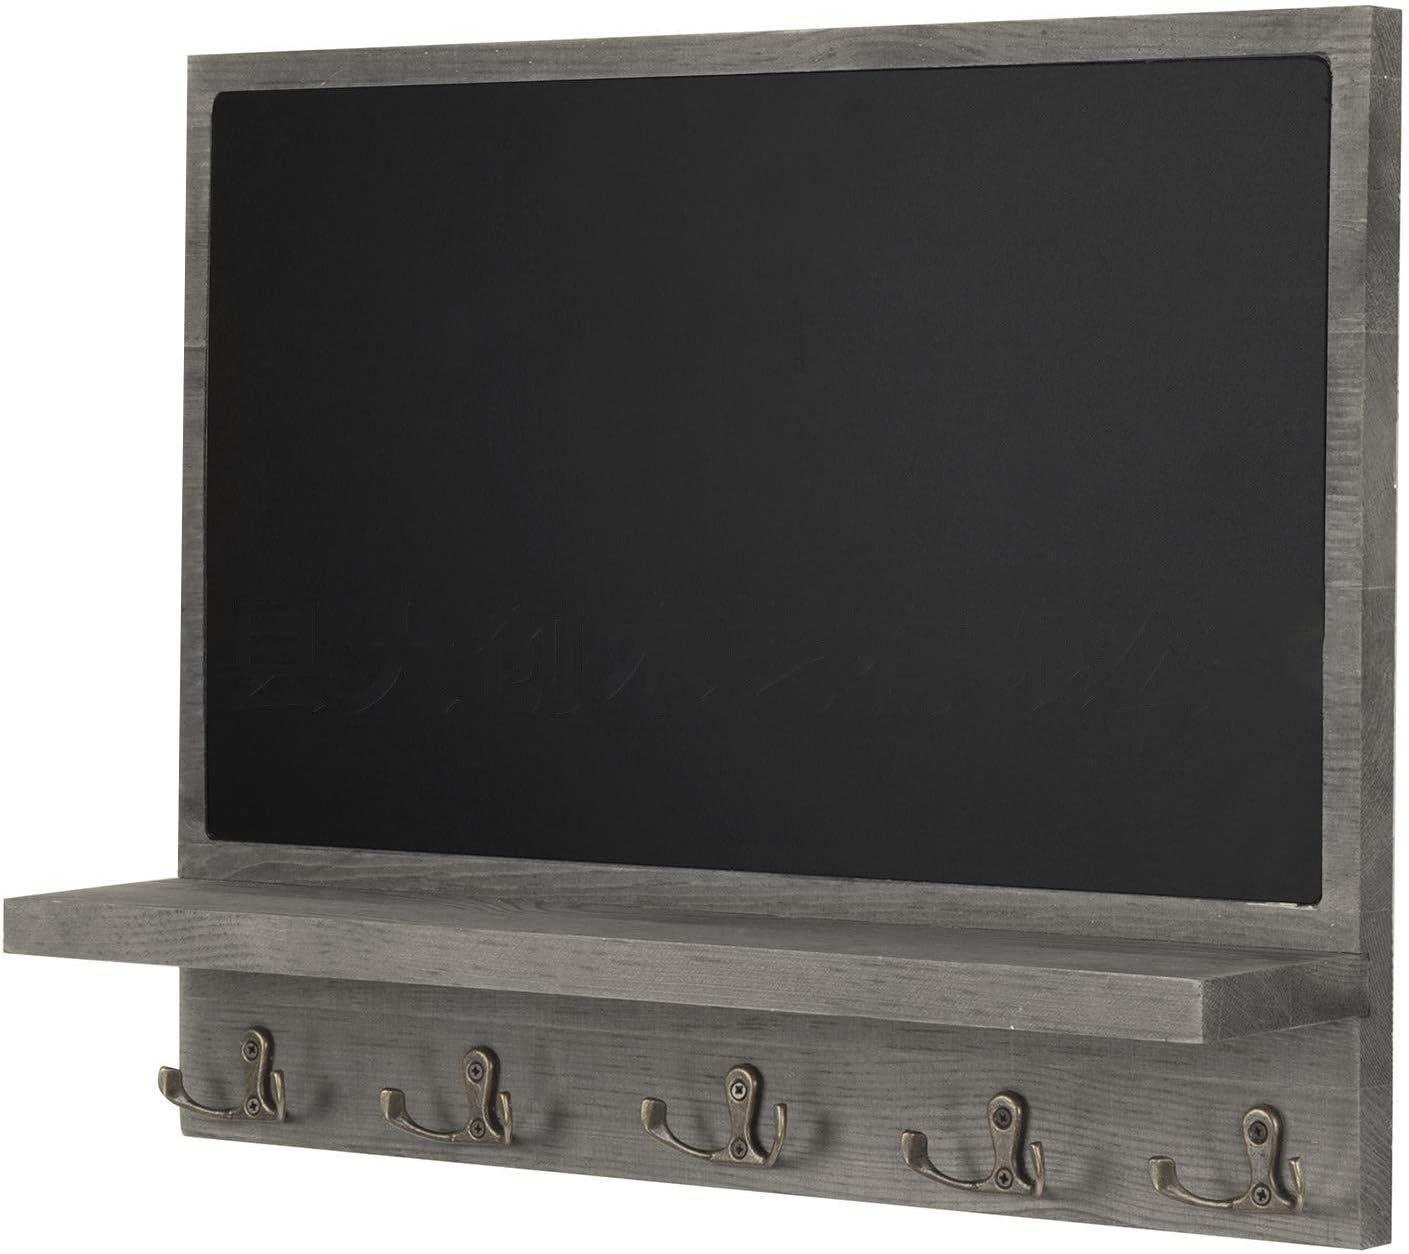 HLD Creative Multi-Function Hanging Type Blackboard Wall Shelf I